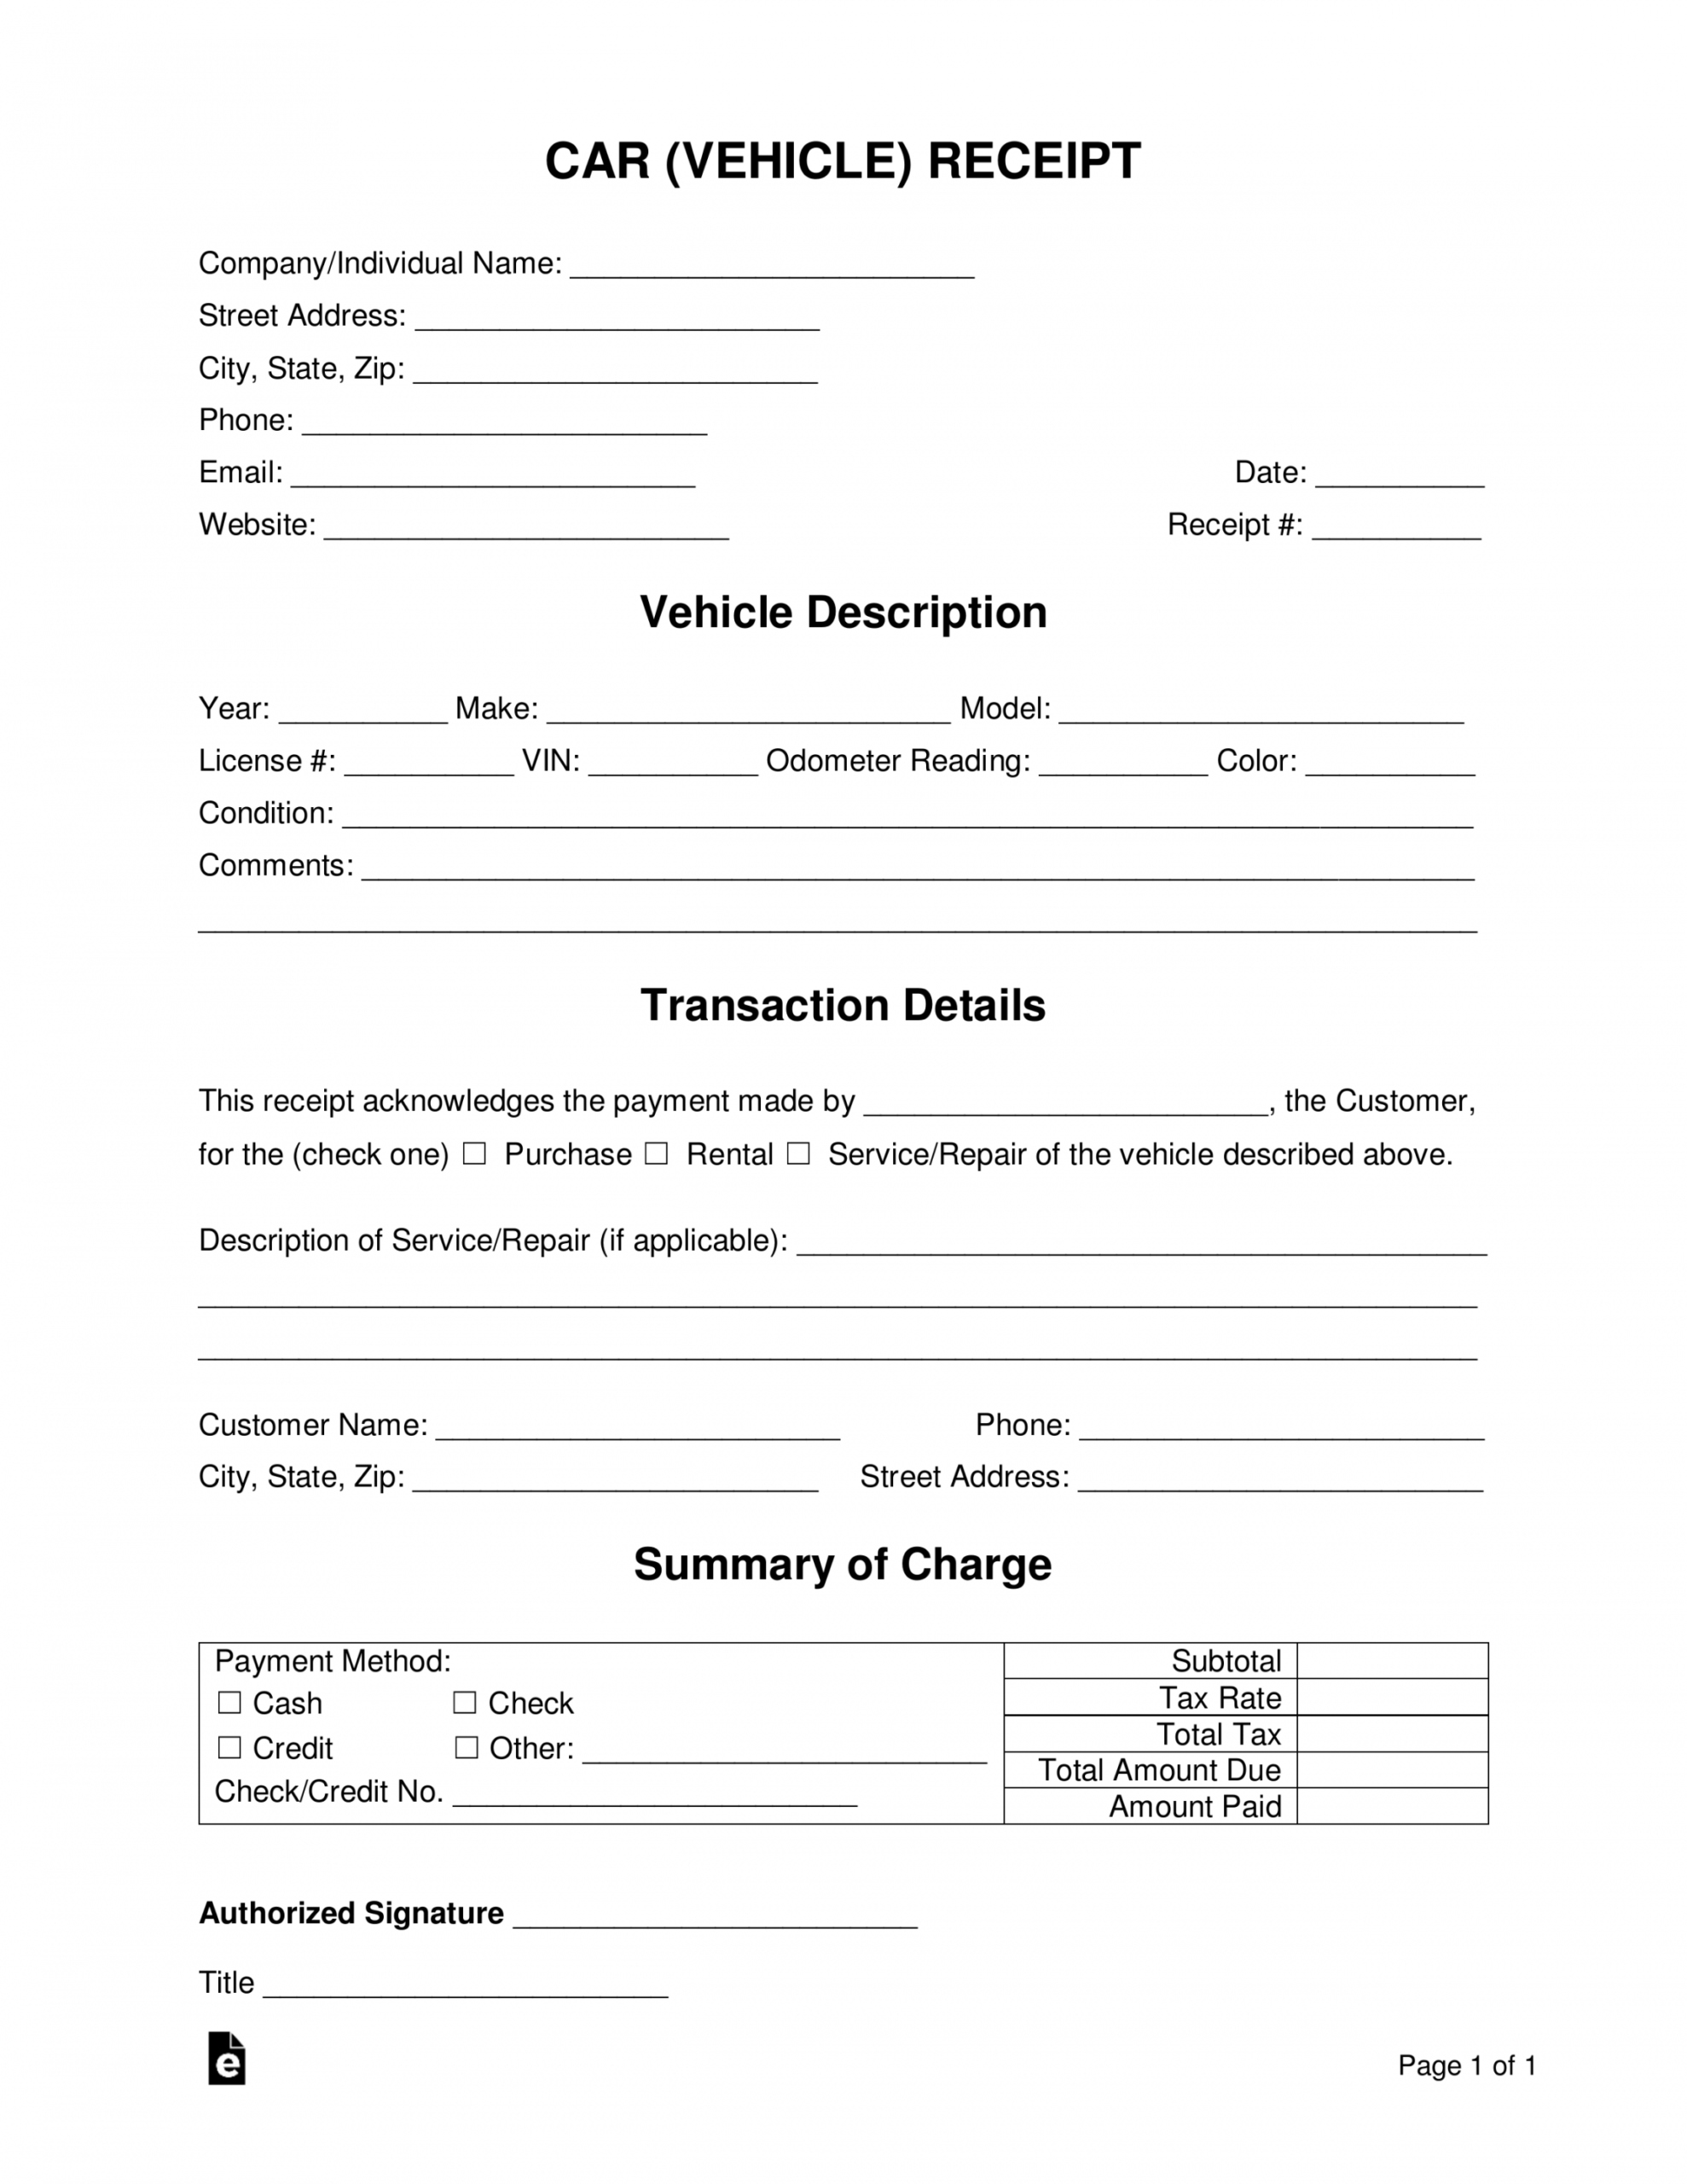 Explore Our Image Of Car Detailing Receipt Template Receipt Template Templates Receipt